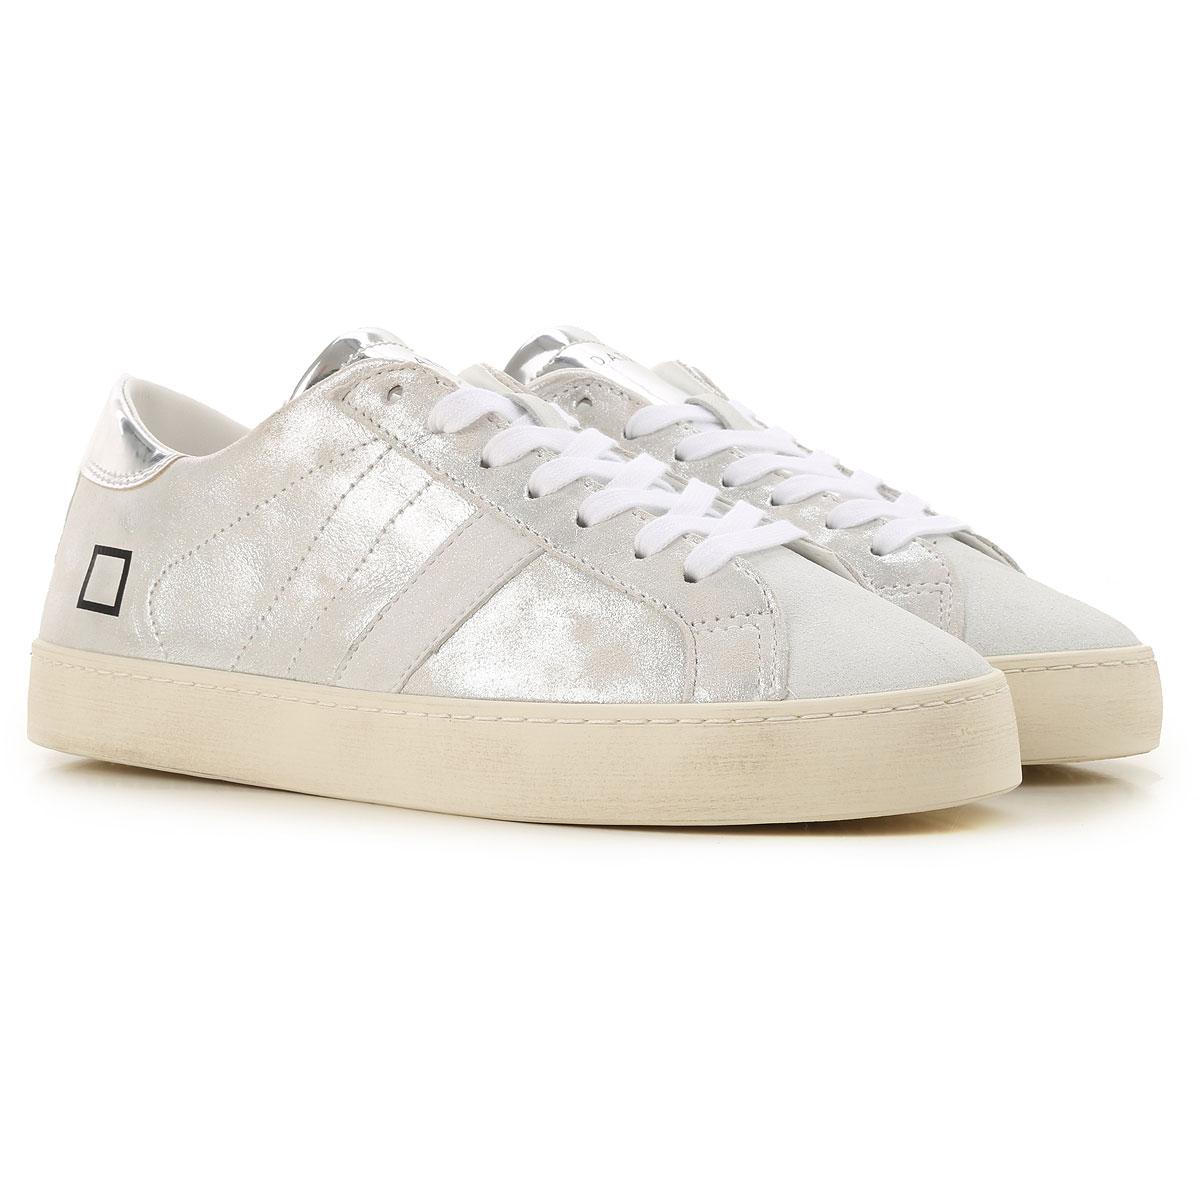 D.A.T.E. Sneakers for Women On Sale, Metallic Silver, Suede leather, 2019, US 6 - UK 3 5 - EU 36 - JP 22 5 US 8 5 - UK 6 - EU 39 - JP 25 US 7 5 - UK 5